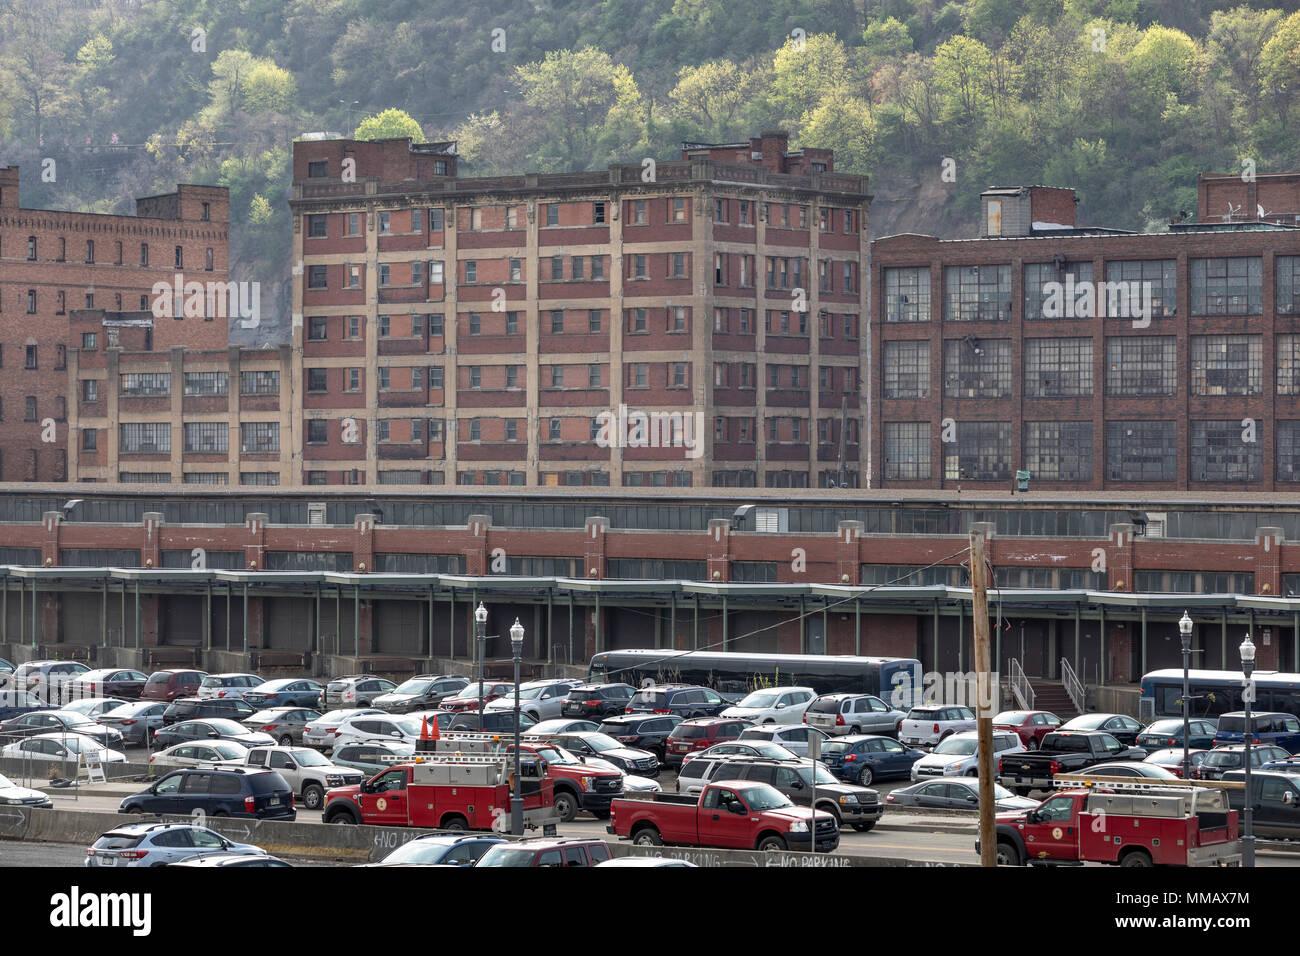 Pennsylvania Railroad Fruit Terminal dans le district de bande, Pittsburgh, PA Photo Stock